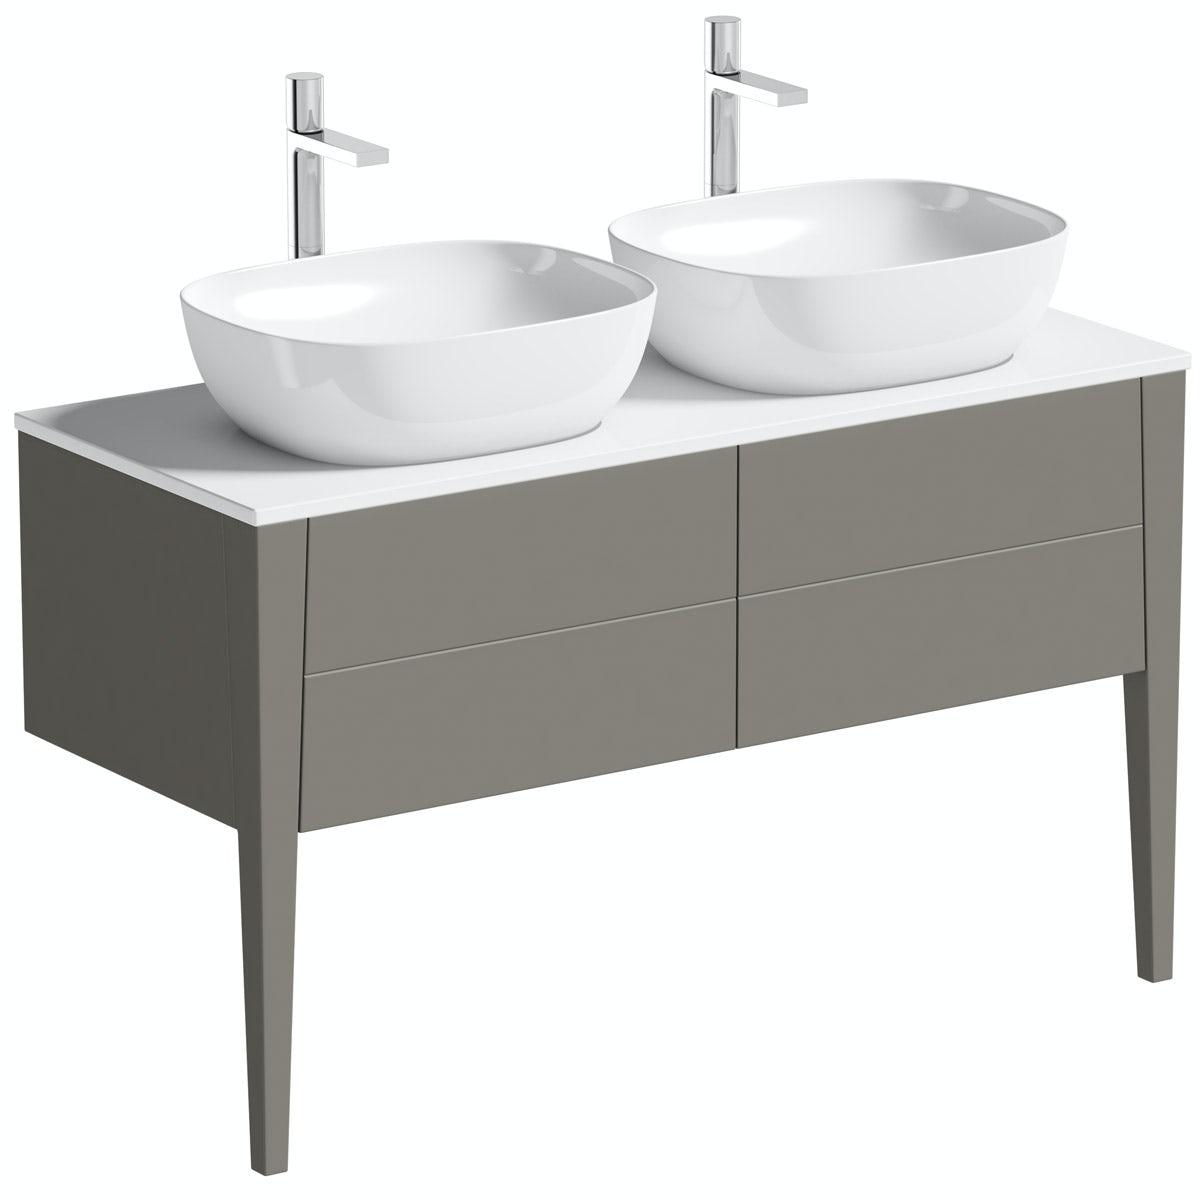 Mode Hale greystone matt countertop double basin vanity unit 1200mm